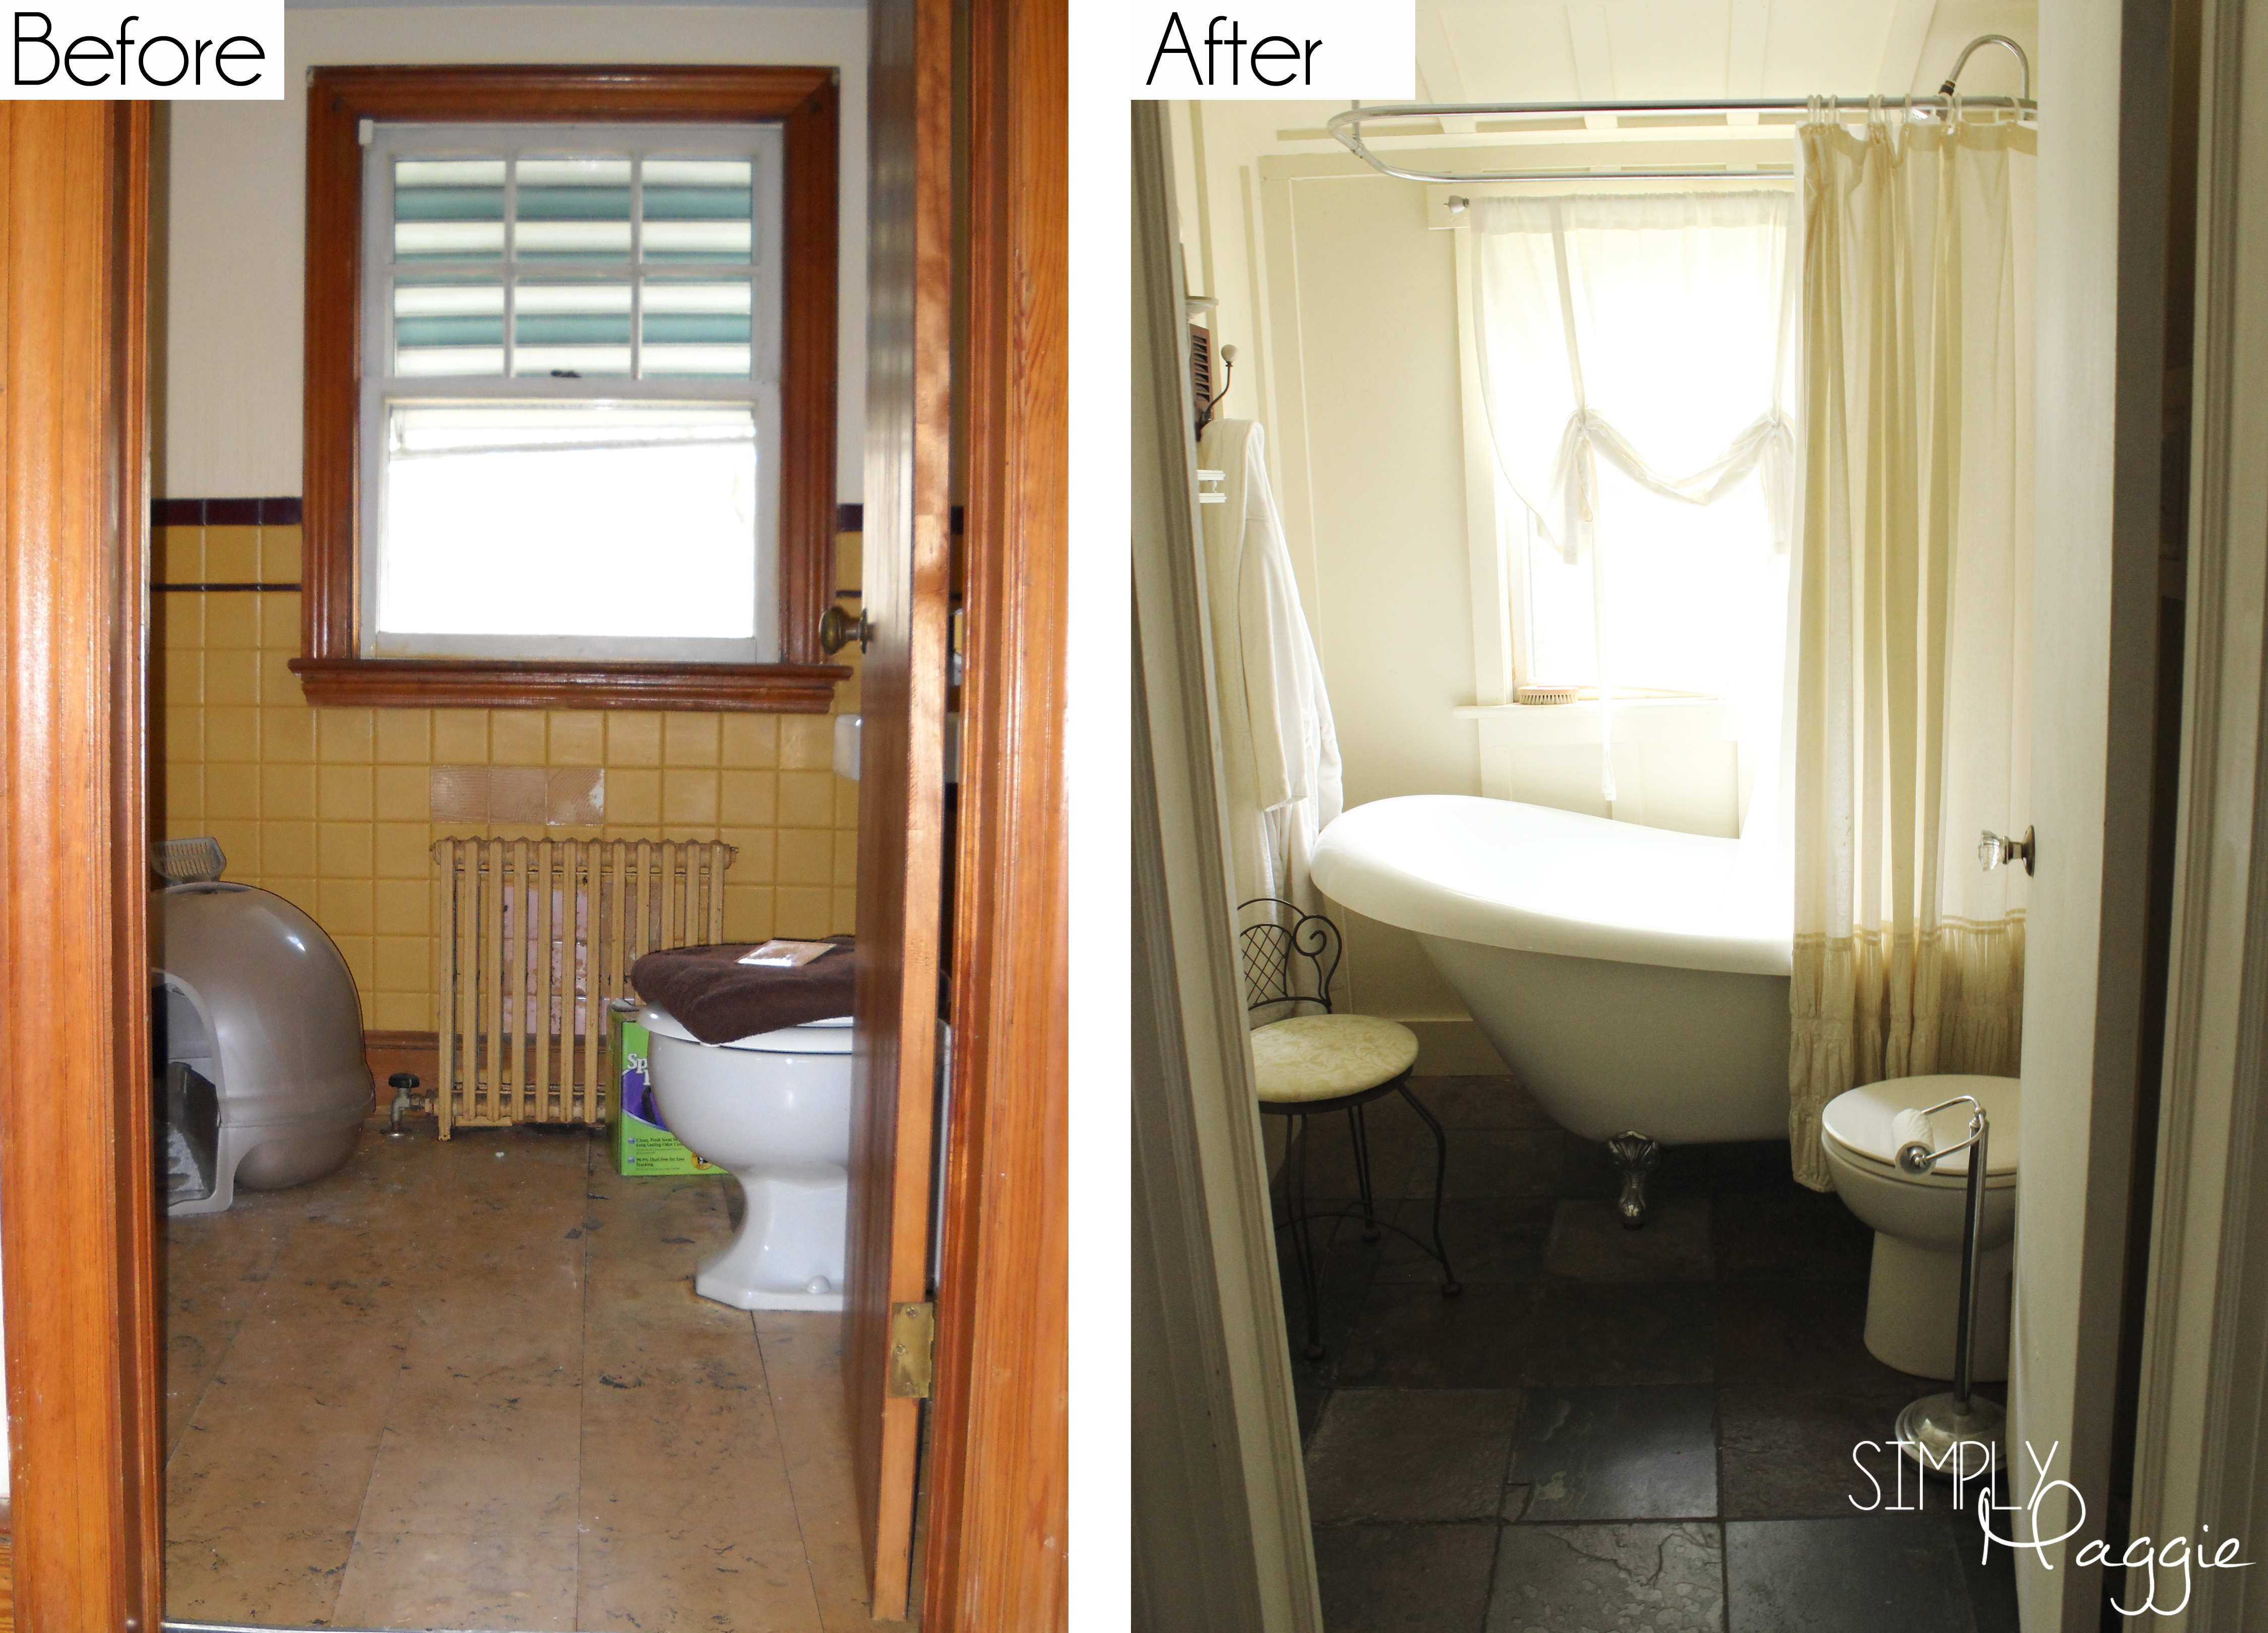 inspirational small bathroom ideas photo gallery plan-Top Small Bathroom Ideas Photo Gallery Image